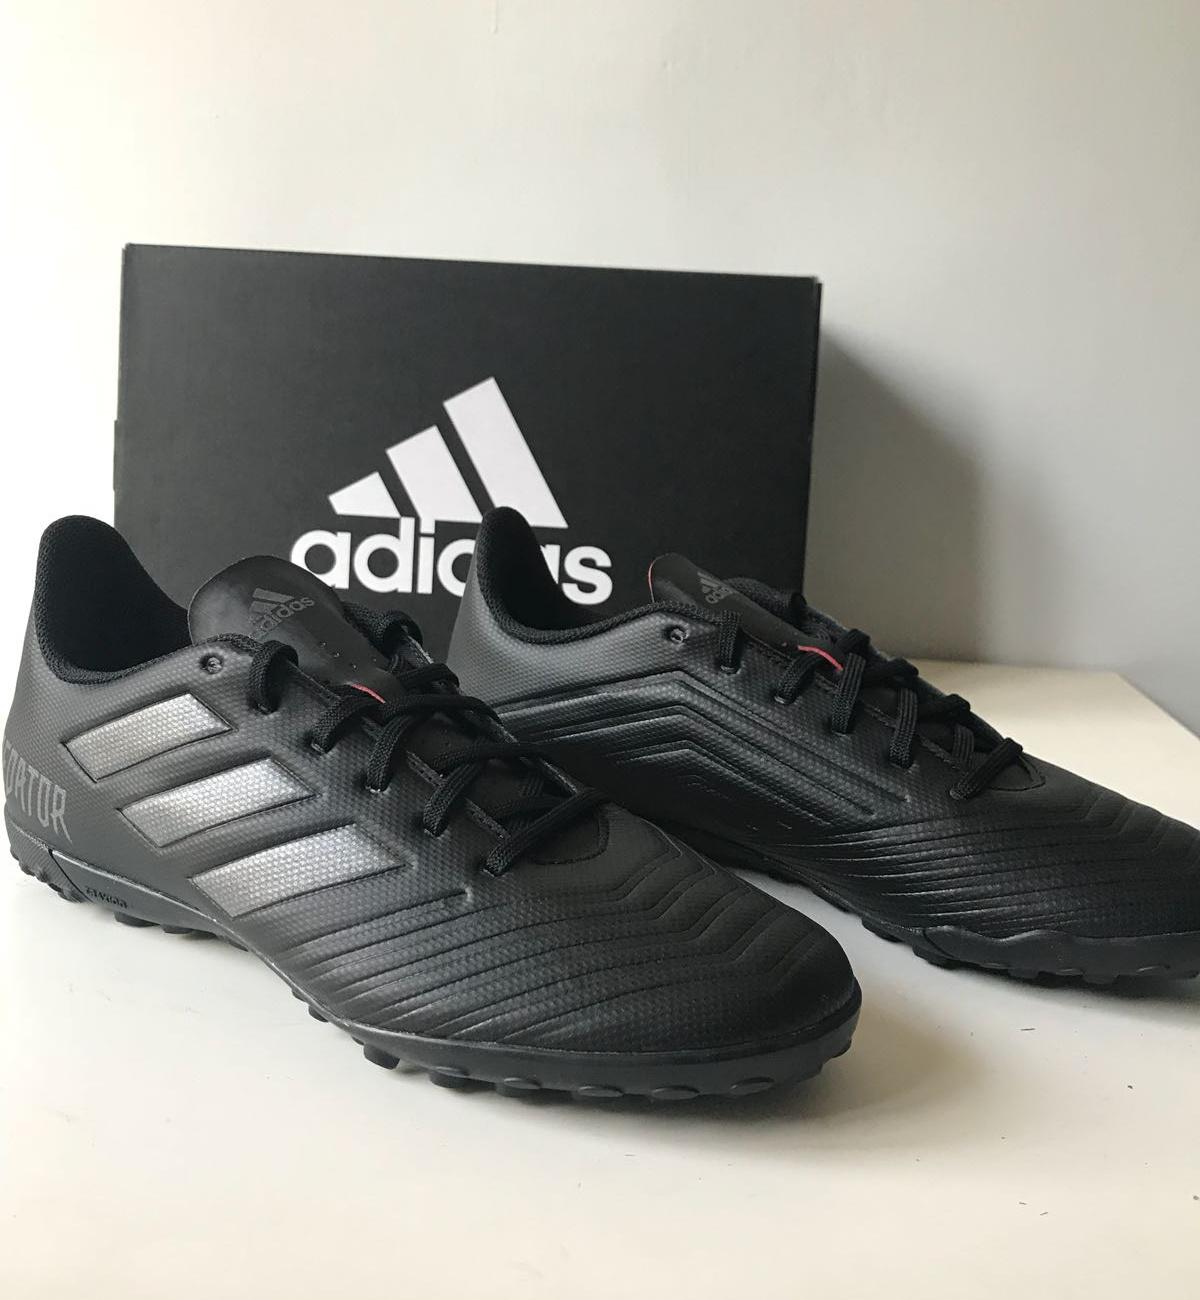 a901ff8bbe6767 Football shoes Adidas Predator Tango 18.4 Noir Five-a-side-football ...